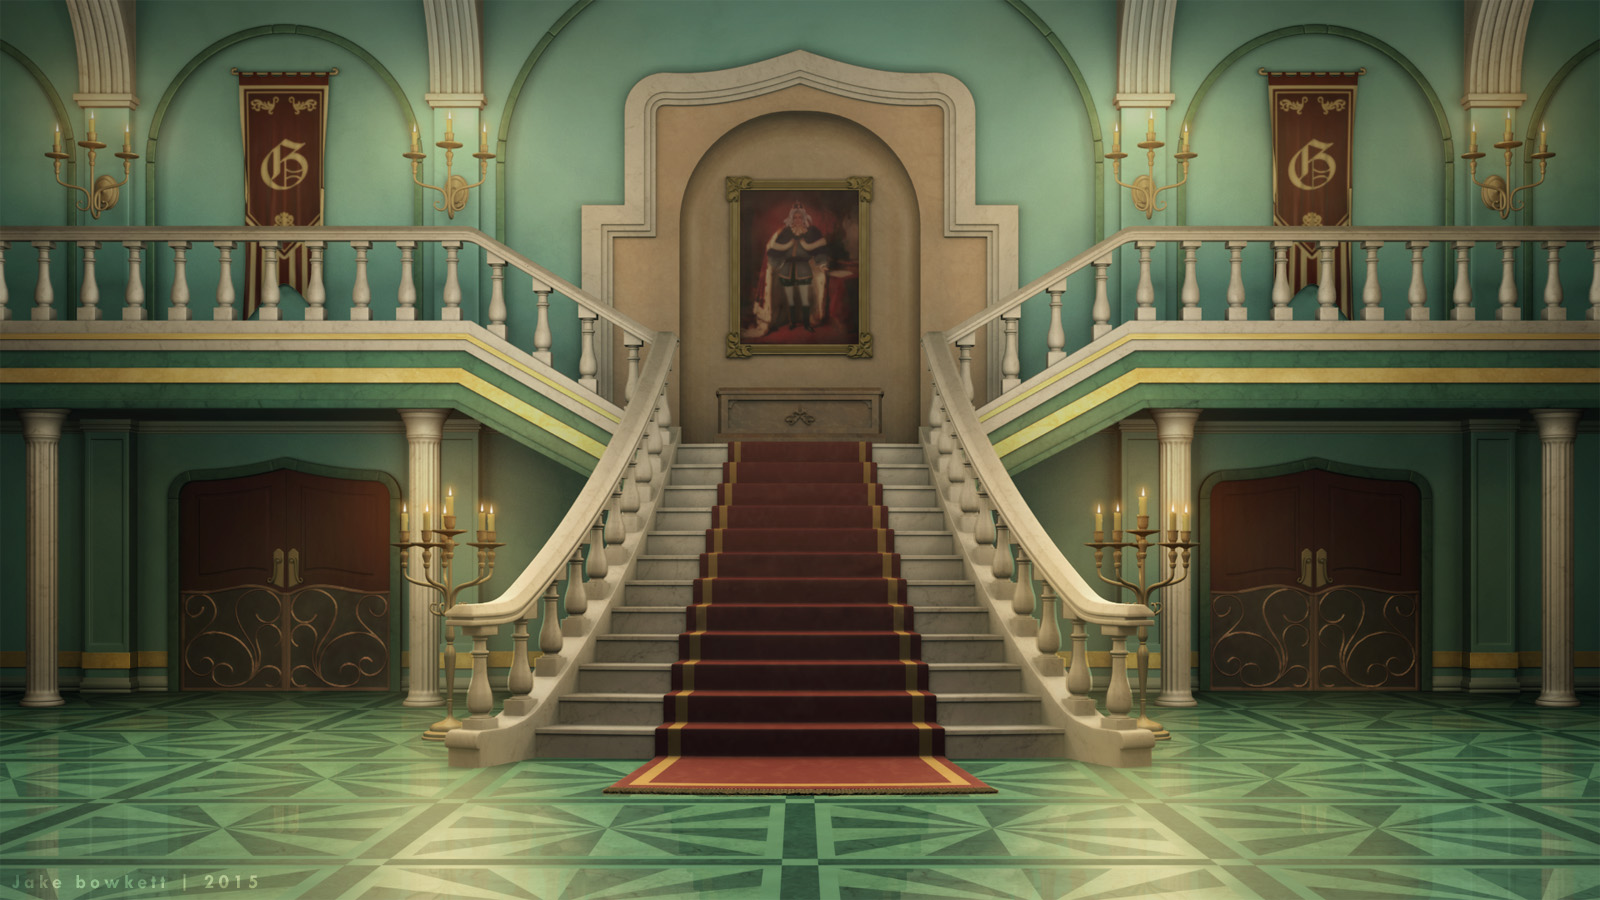 Grand Hall Image Jigsawpieces Mod Db